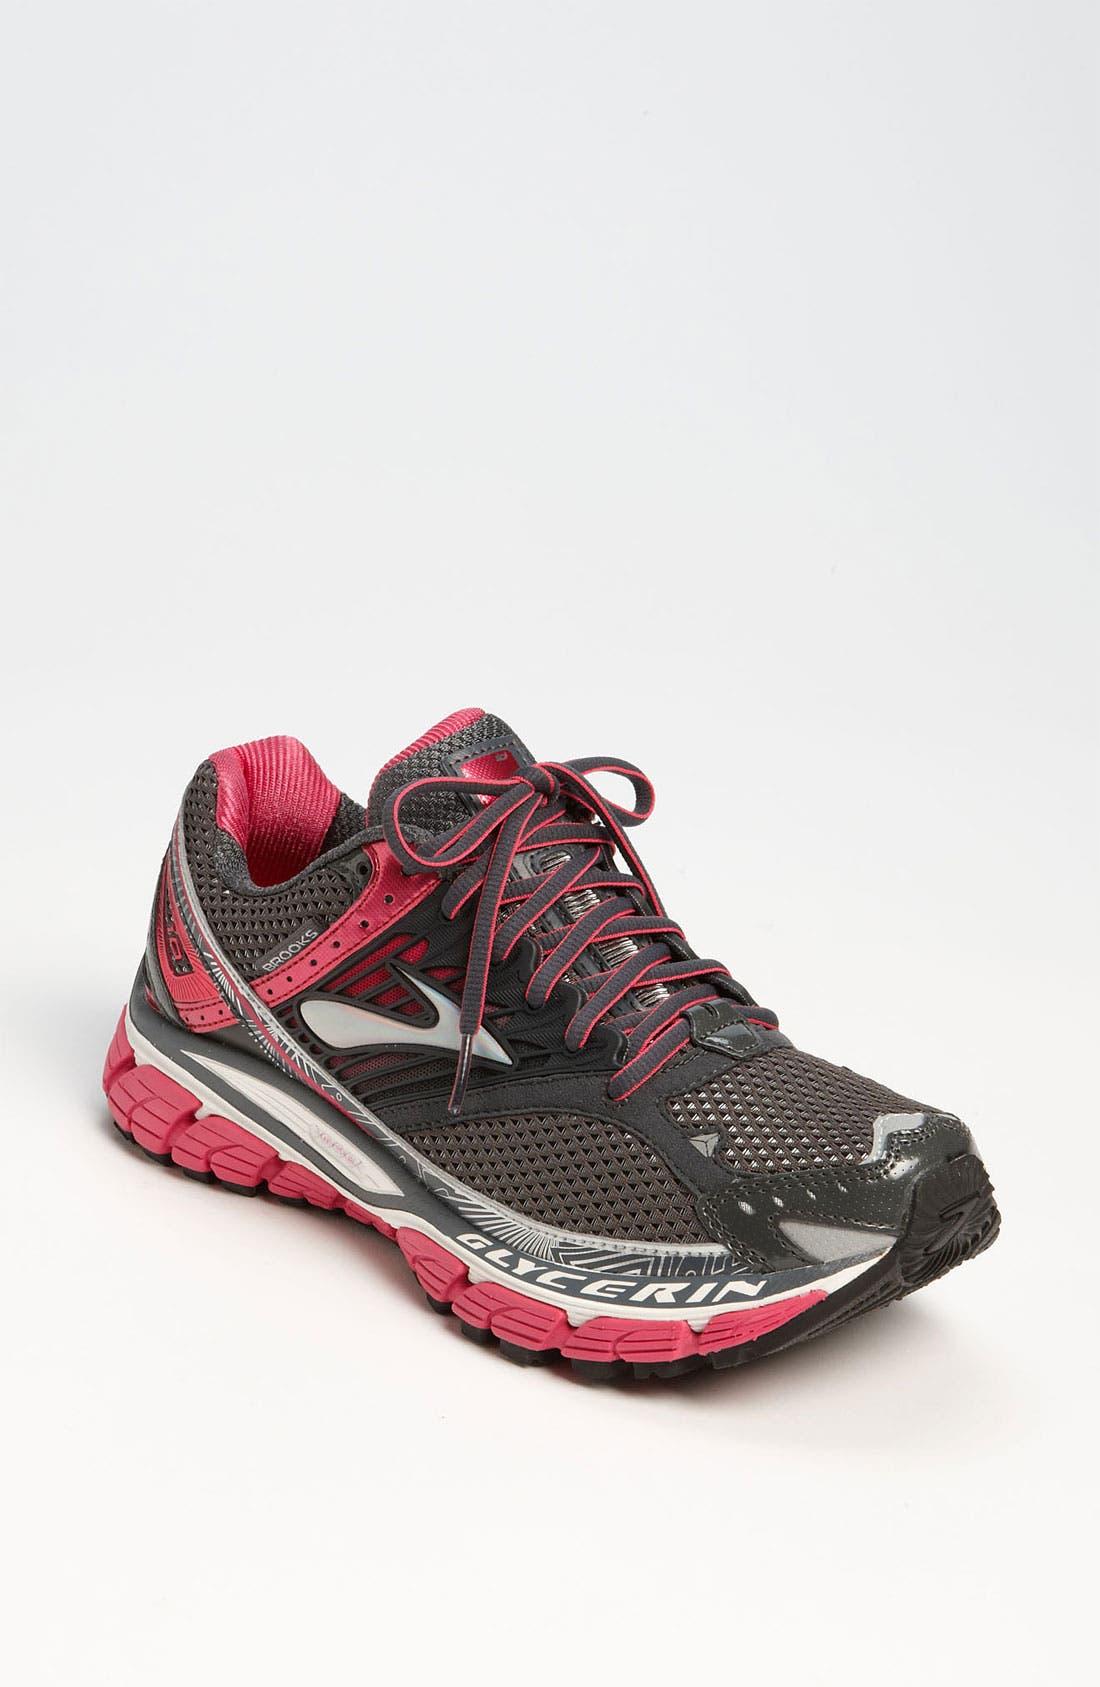 Alternate Image 1 Selected - Brooks 'Glycerin 10' Running Shoe (Women) (Regular Retail Price: $139.95)